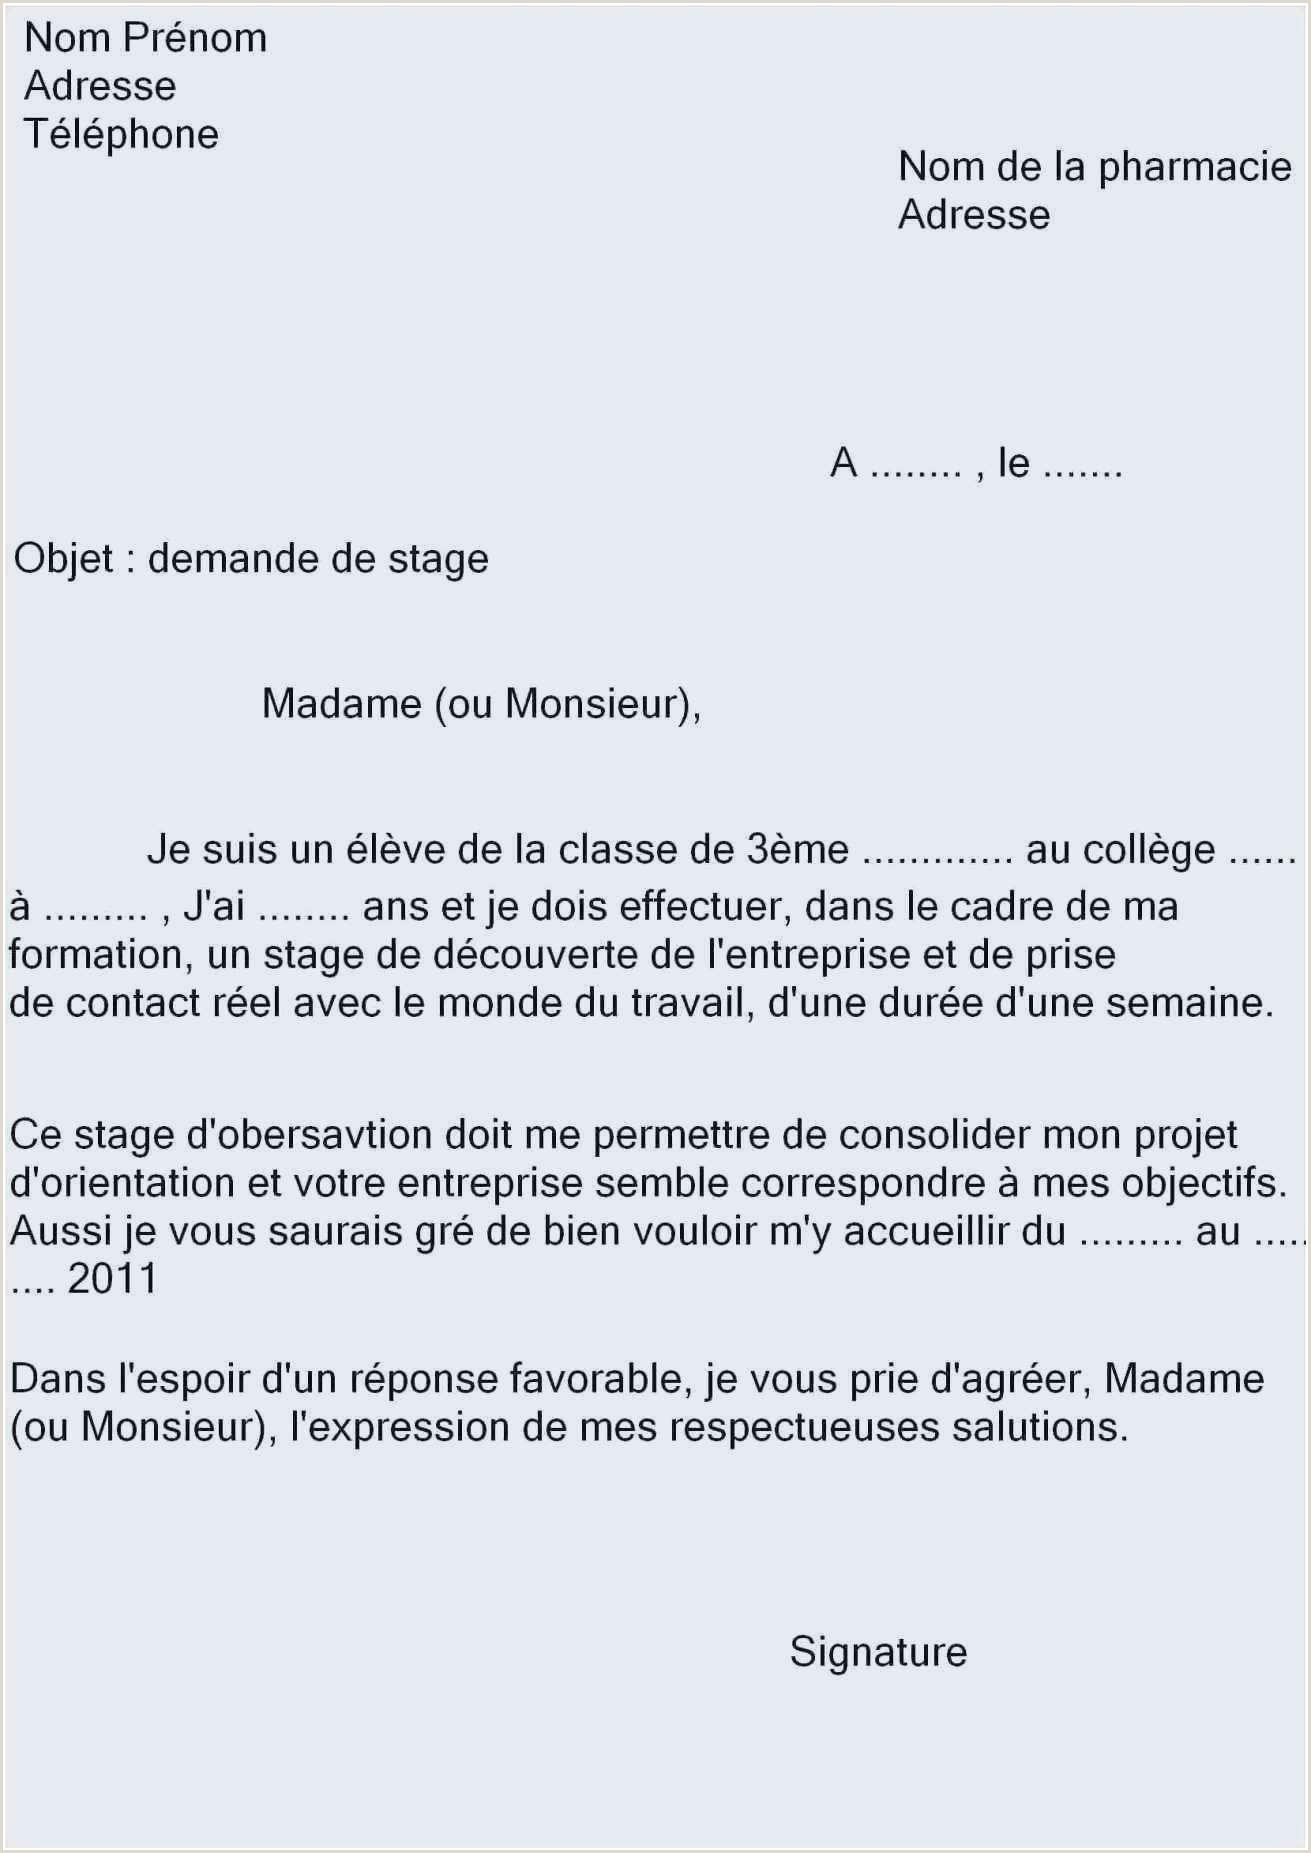 Exemple Cv Francais Simple Luxury Exemple Cv En Anglais